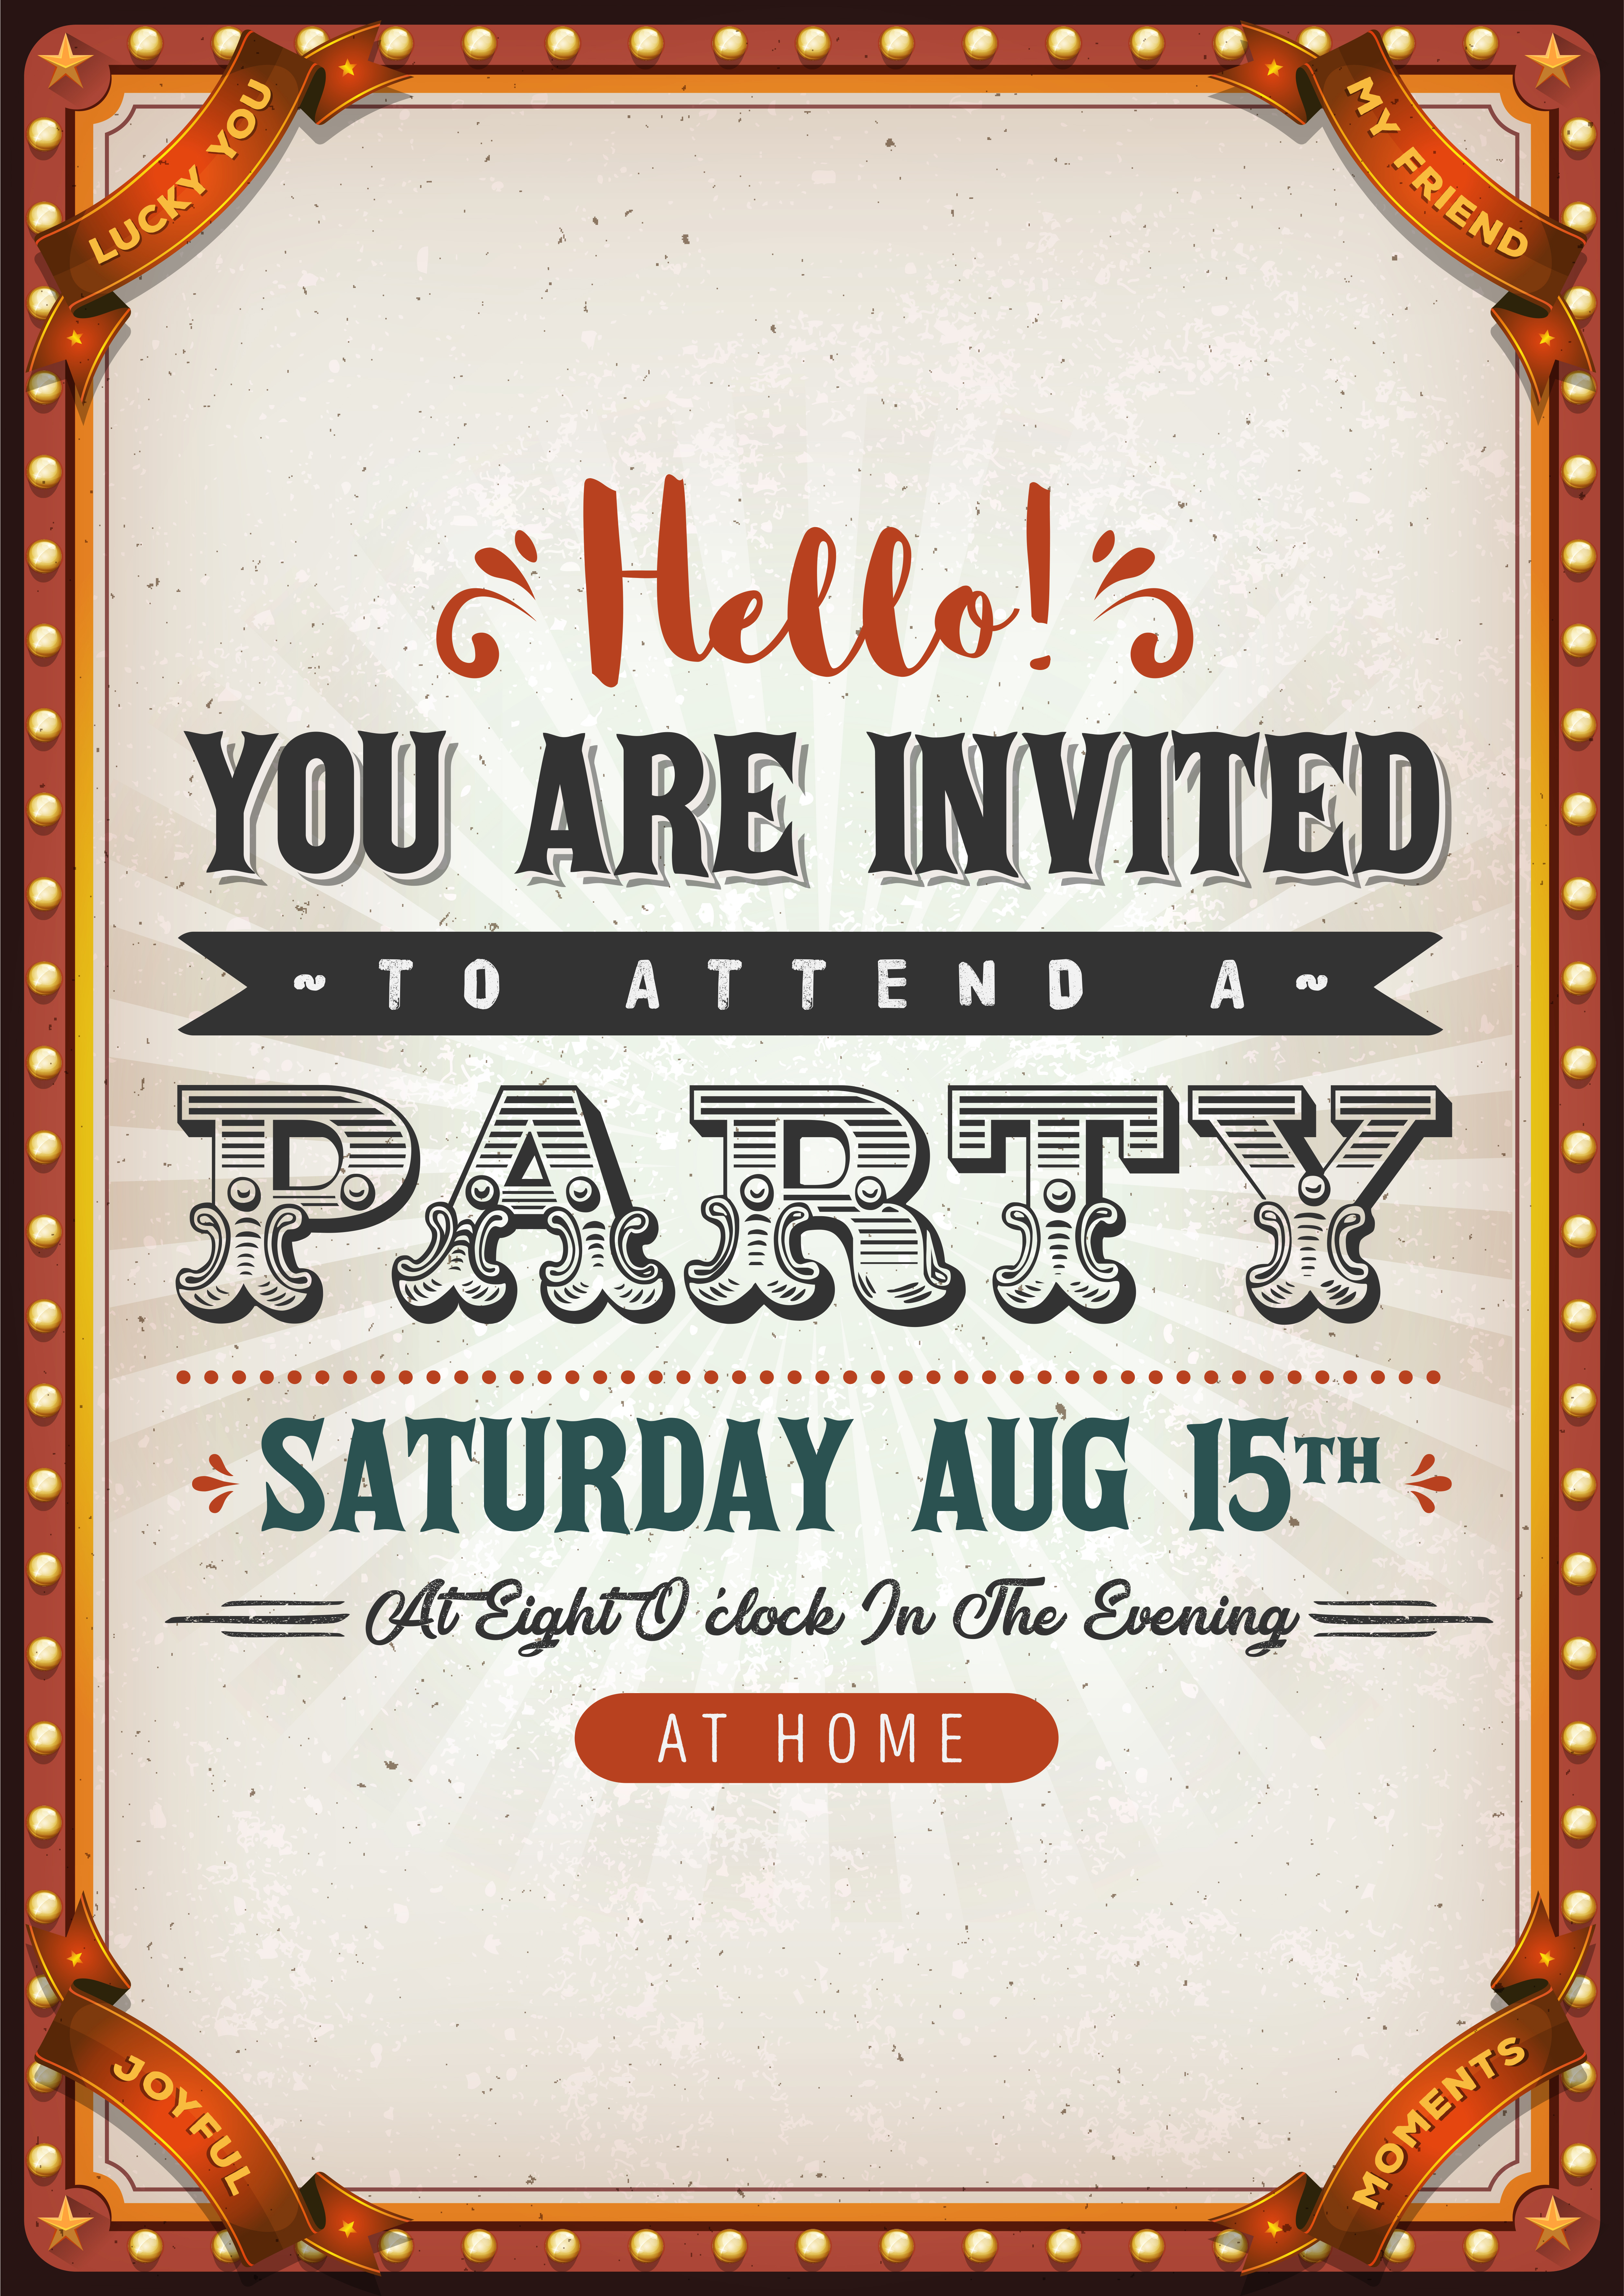 vintage party invitation card  download free vectors